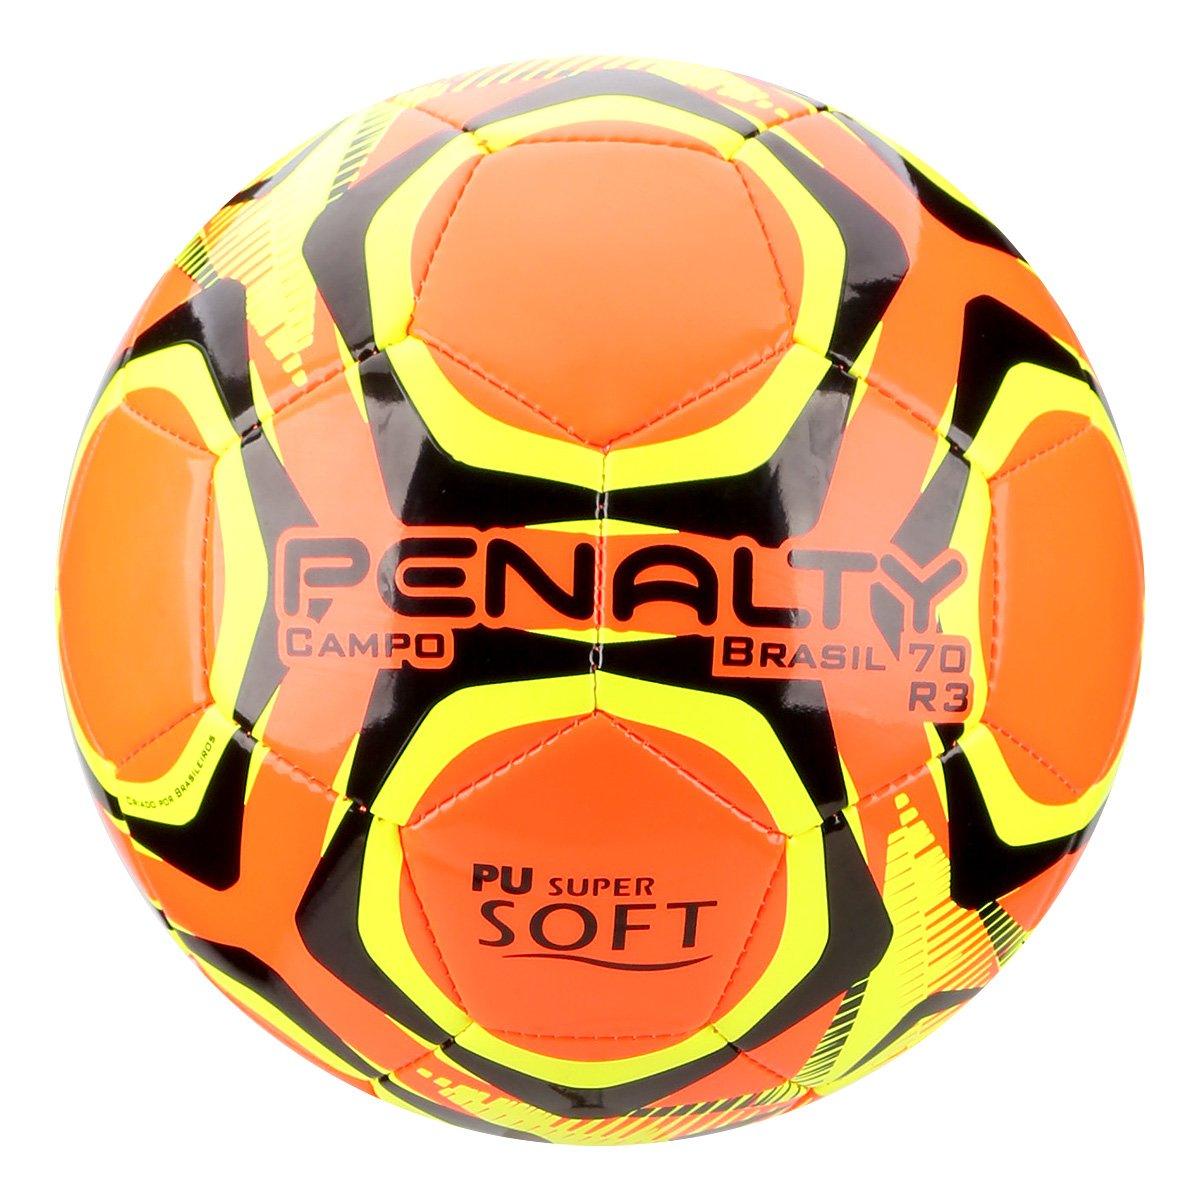 Bola de Futebol Campo Penalty Brasil 70 R3 LX 351db4145e815